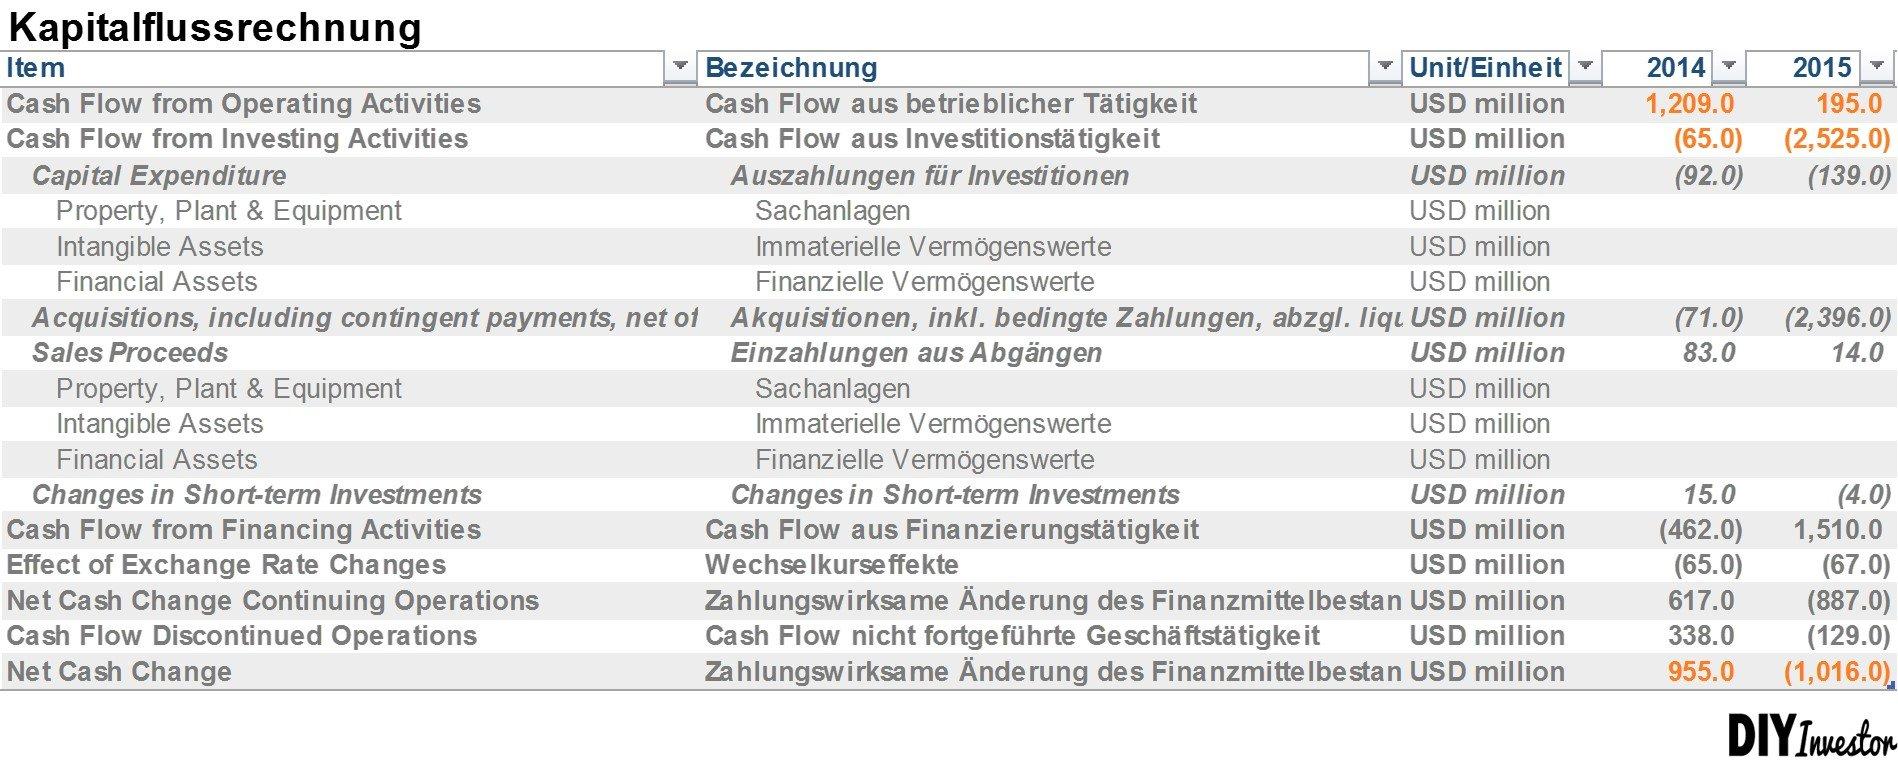 Jahresabschluss: Kapitalflussrechnung